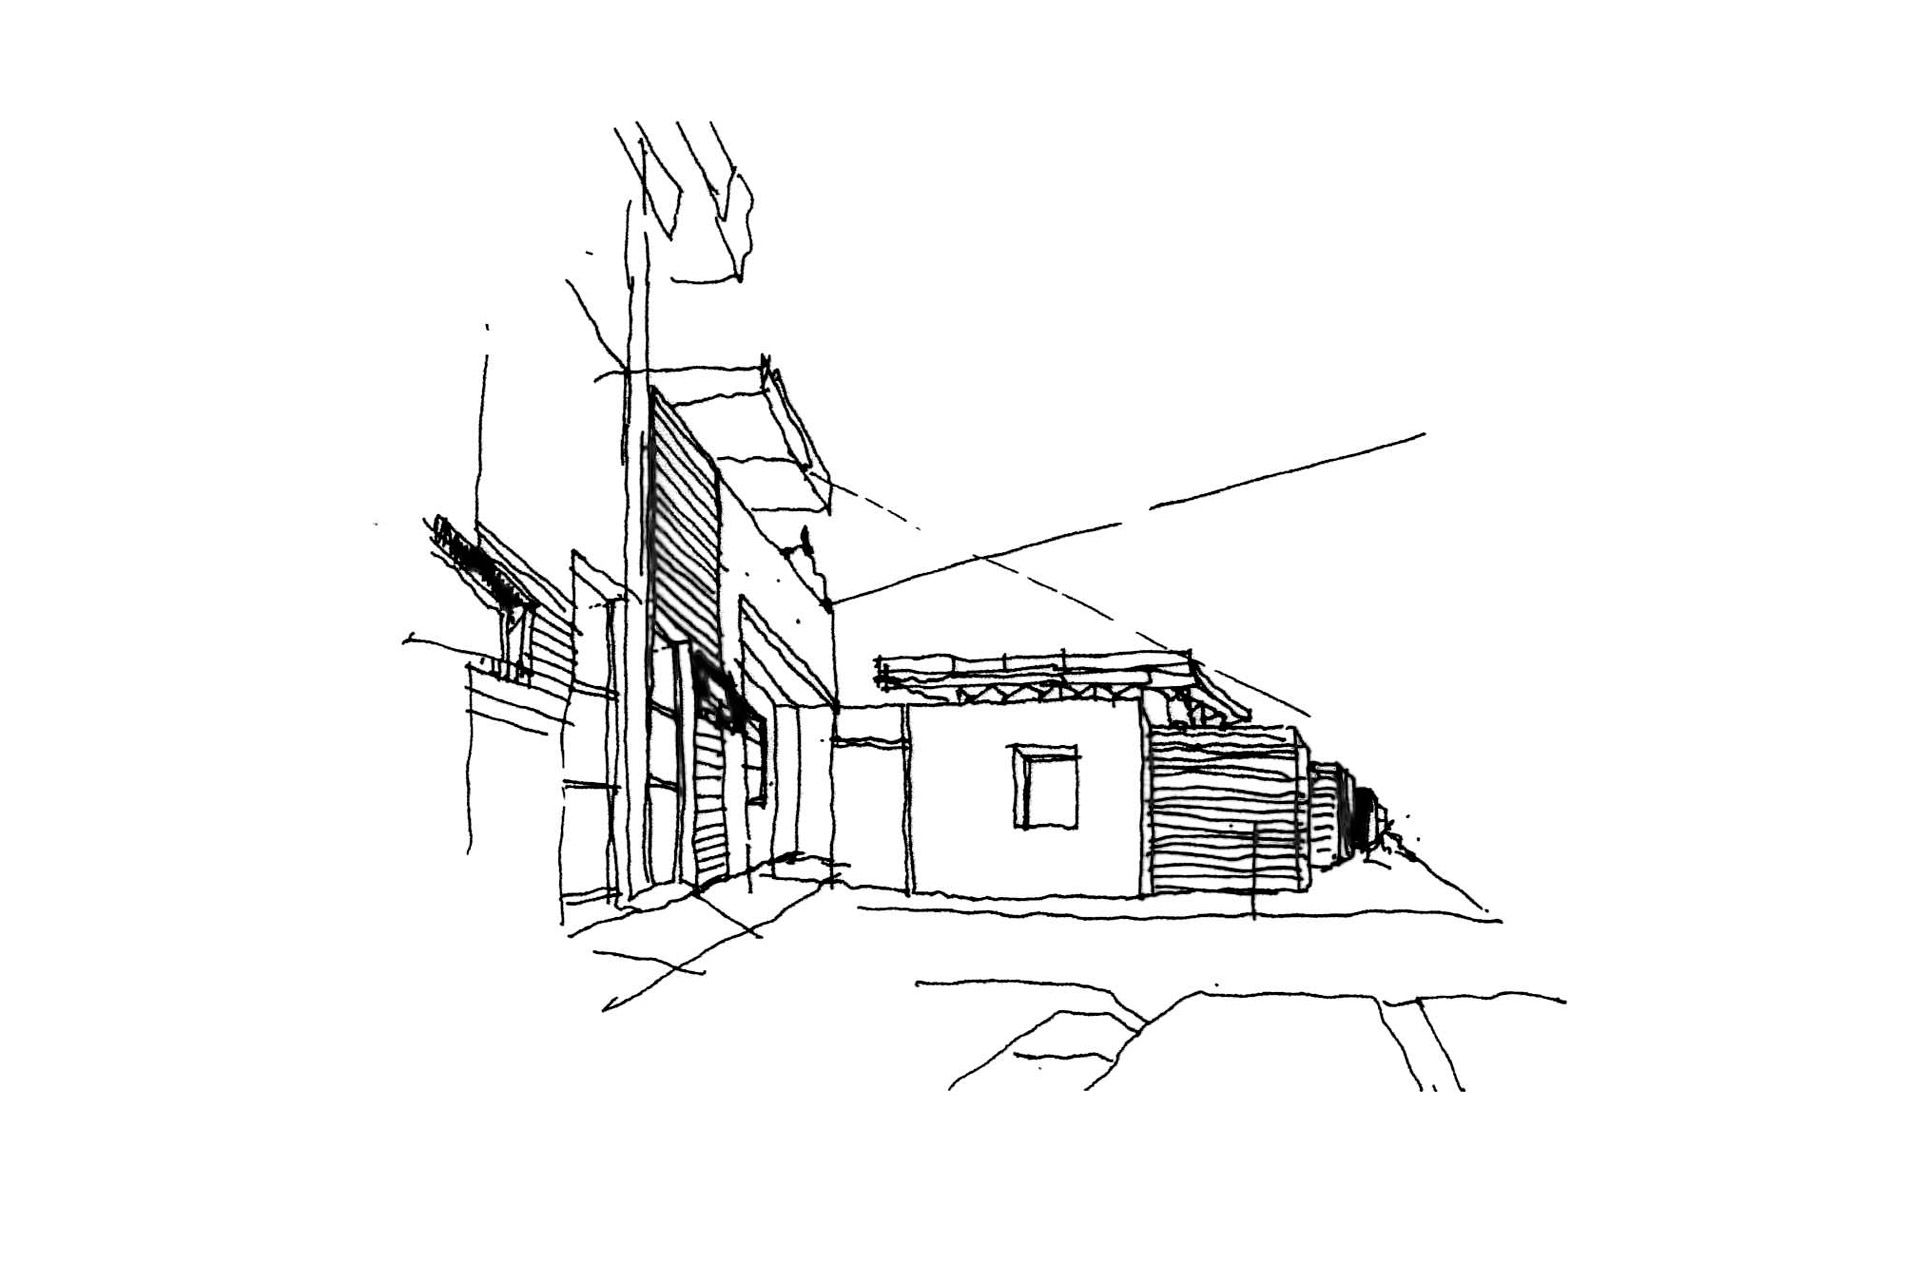 Bdlc bulla road 03 courtyard-view wr